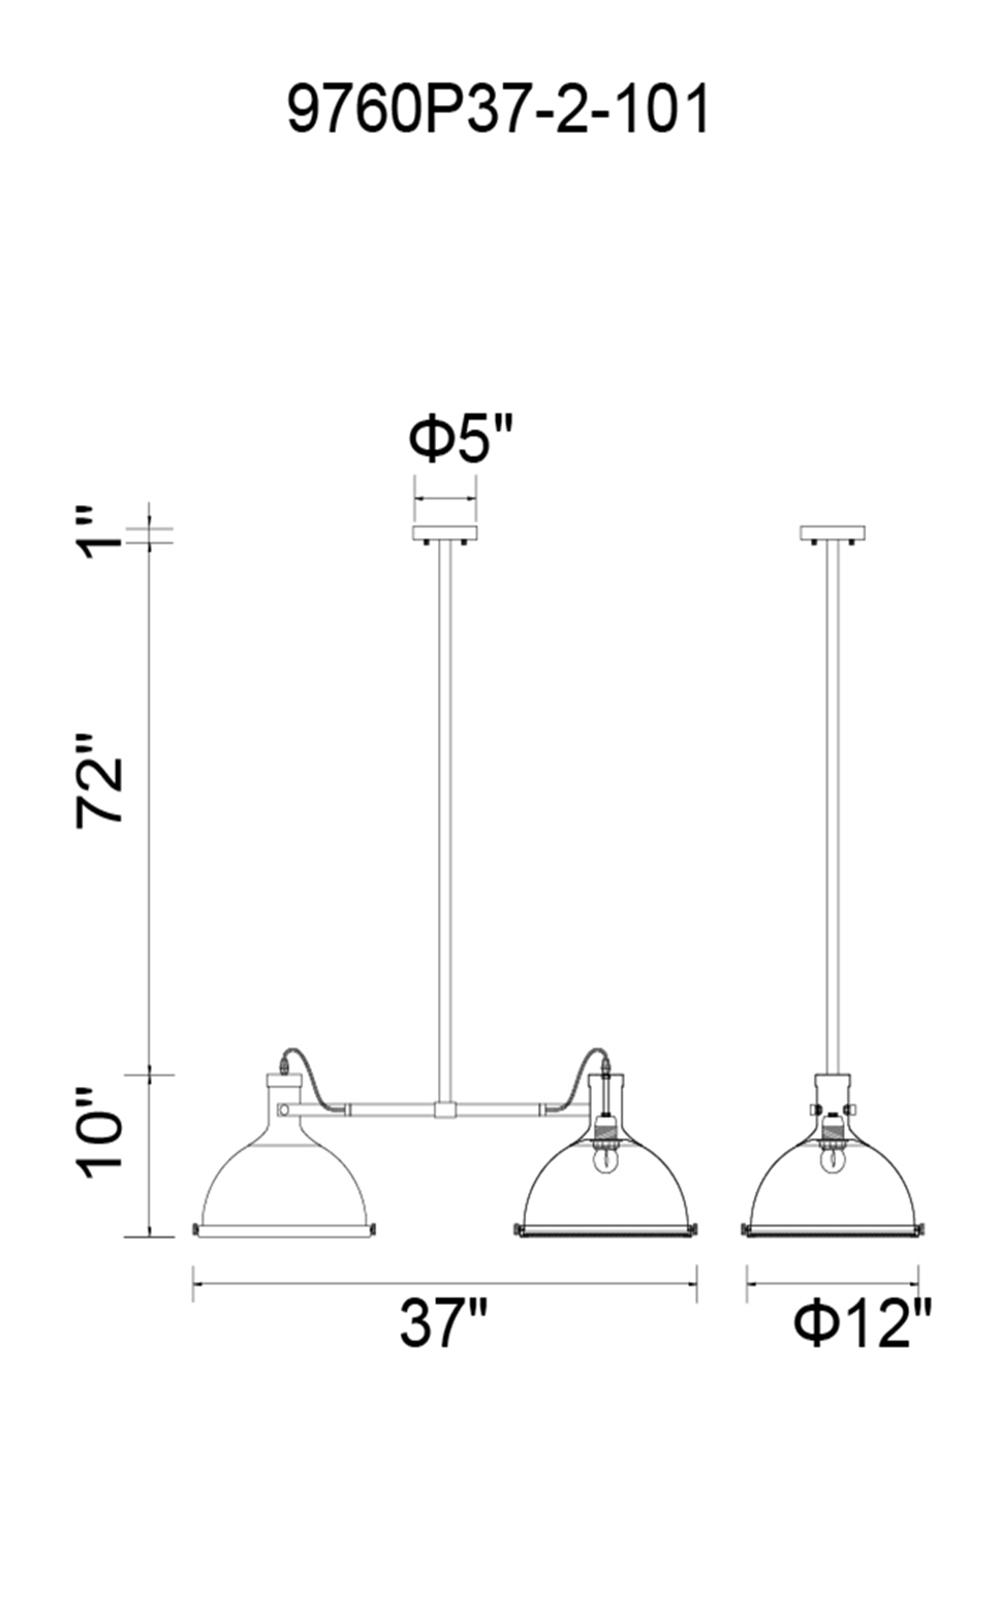 CWI Lighting Strum 2 Light Island Chandelier With Black Finish Model: 9760P37-2-101 Line Drawing